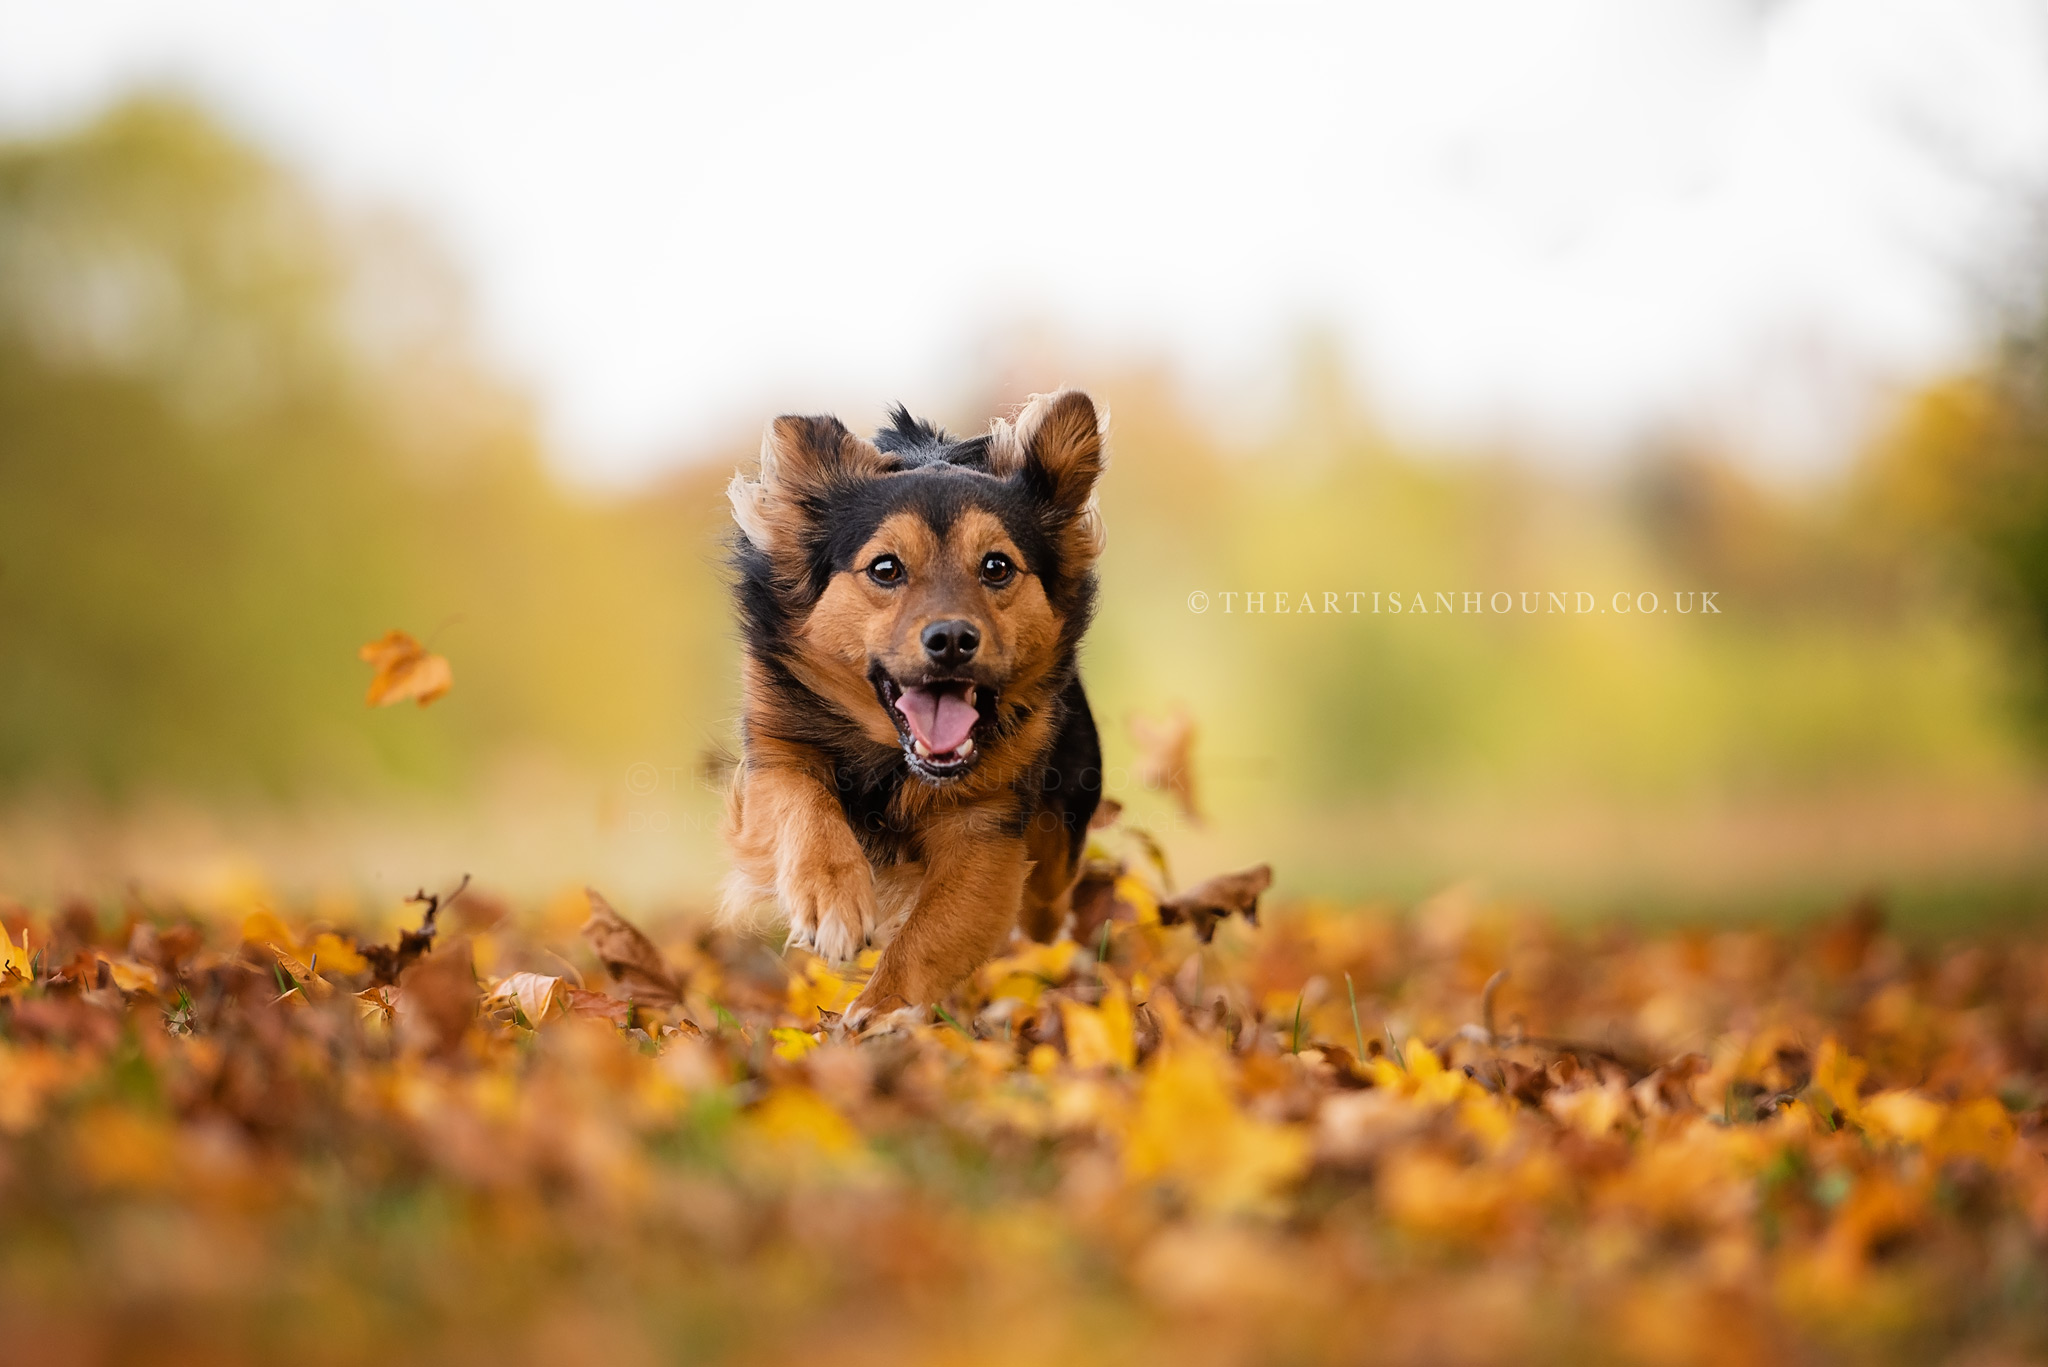 Little dog running through autumn leaves